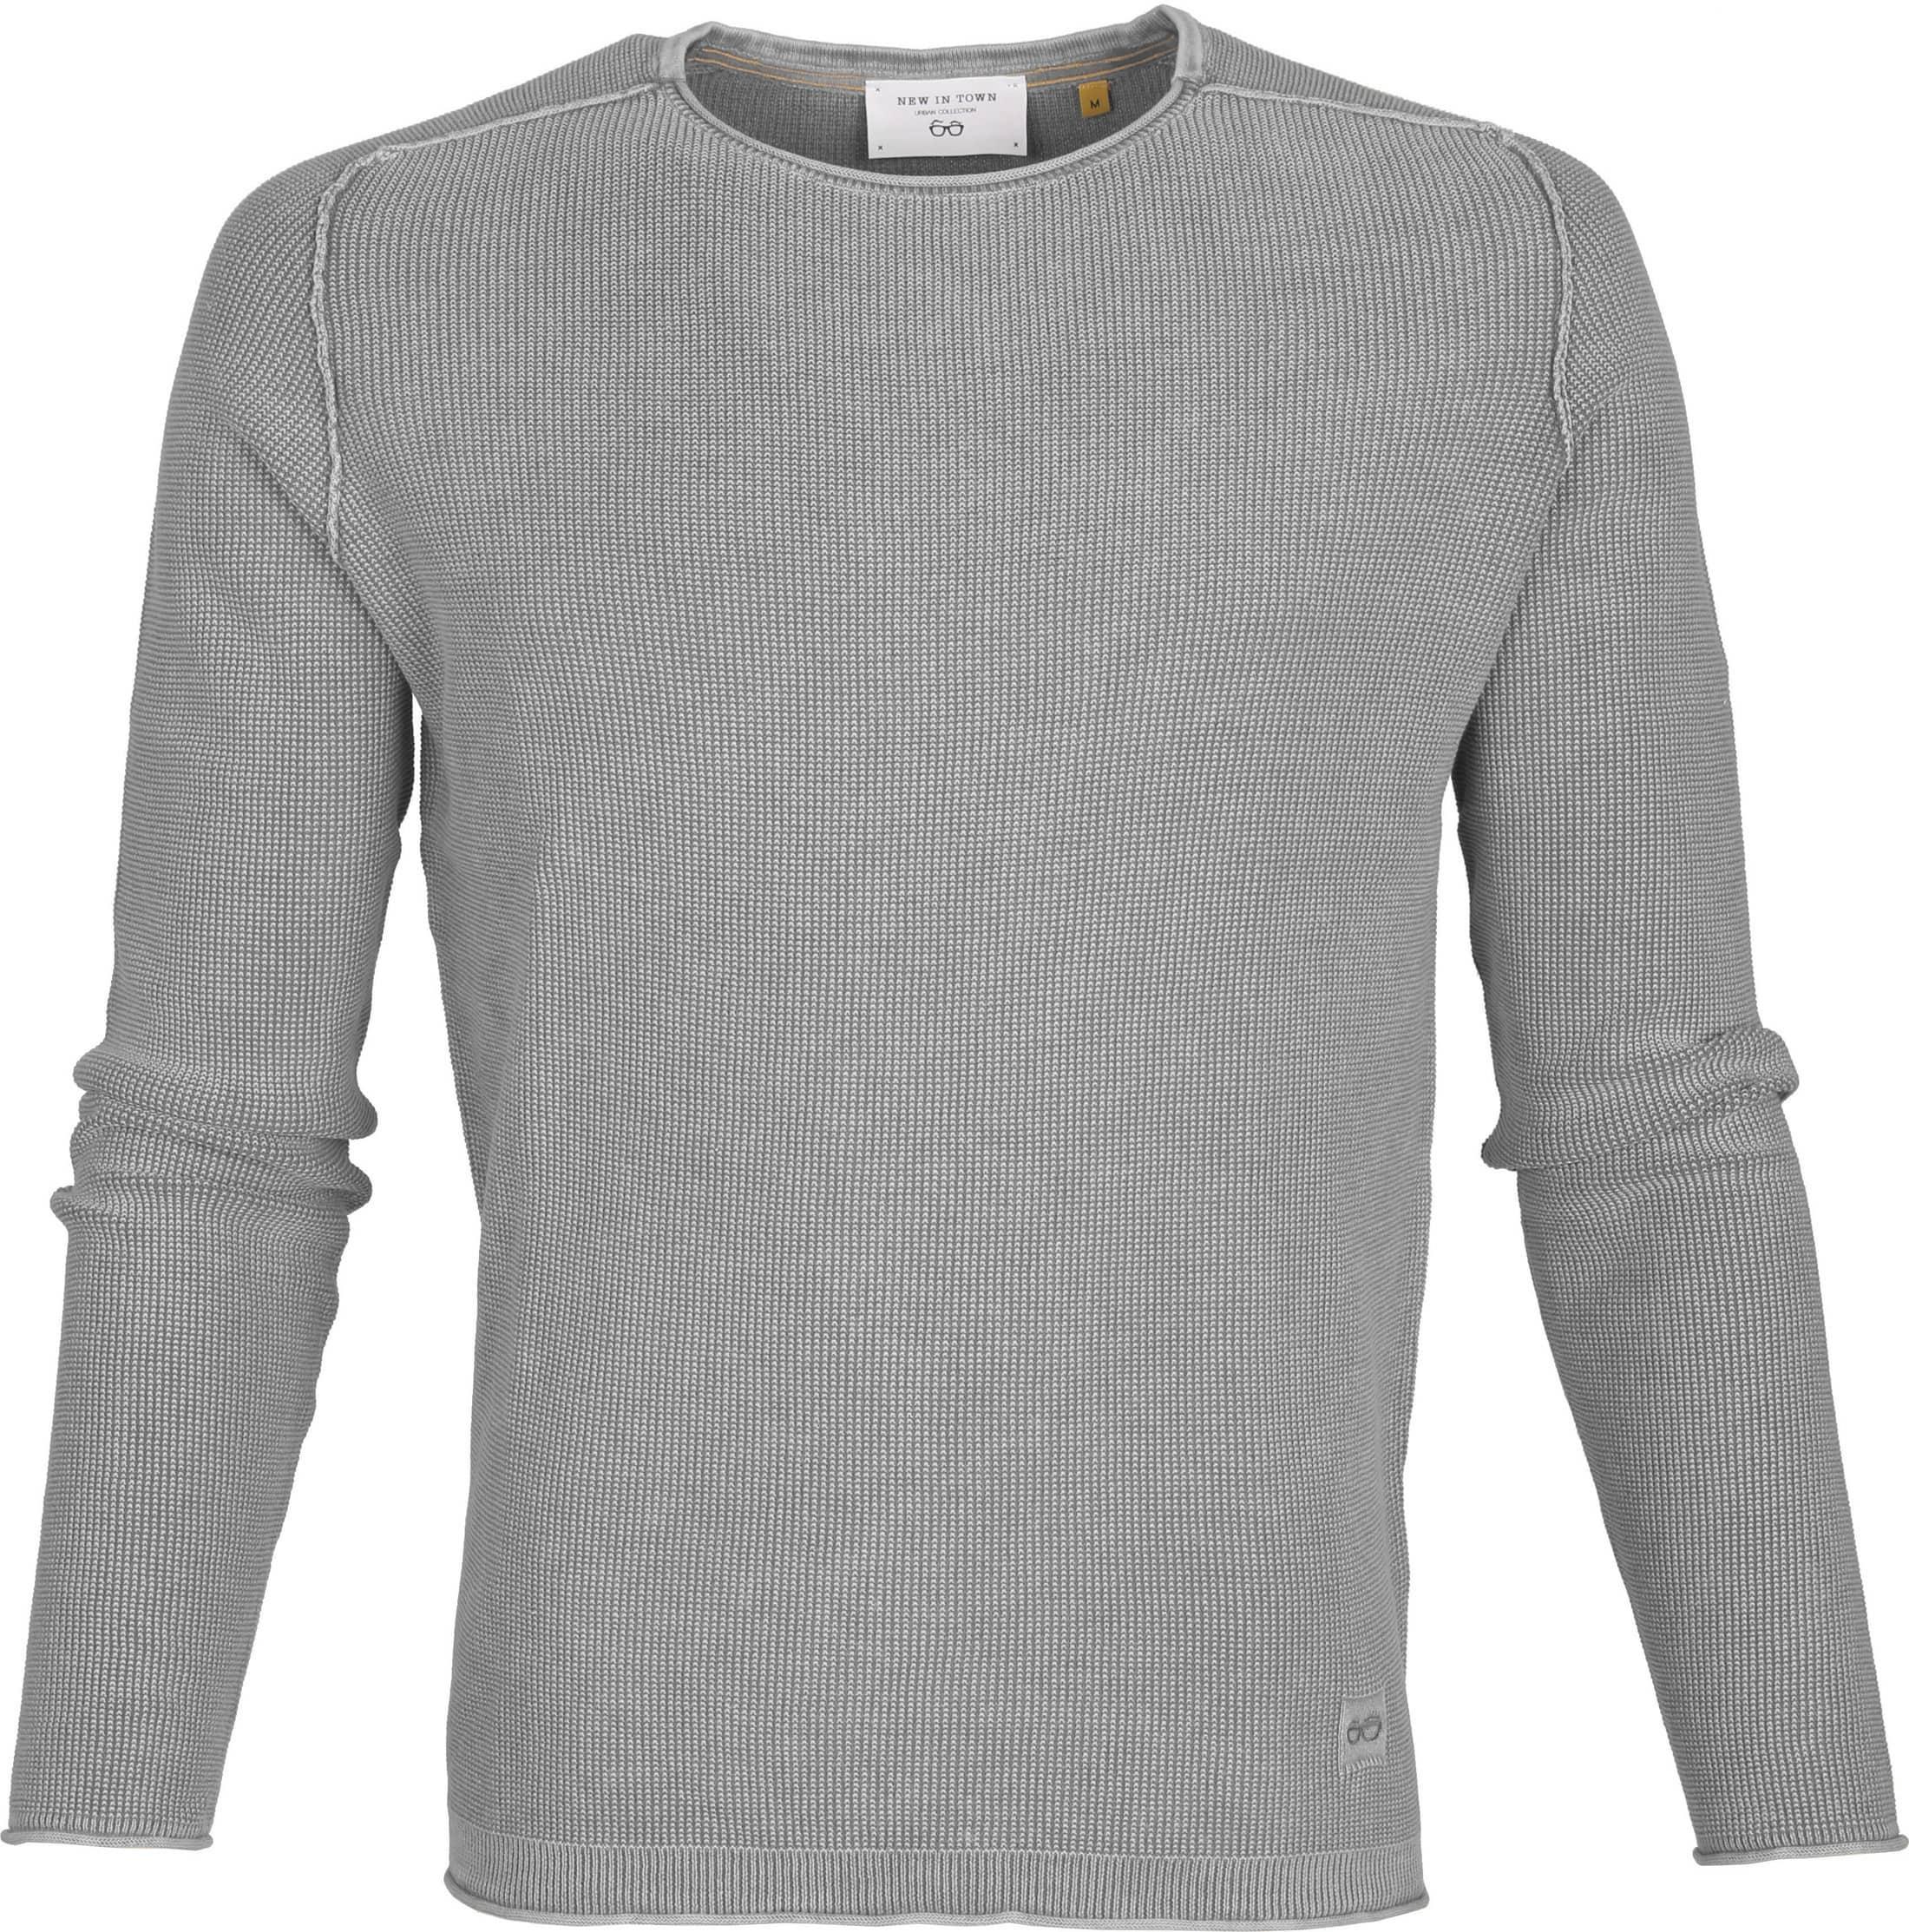 New In Town Sweater Strick Grijs foto 0